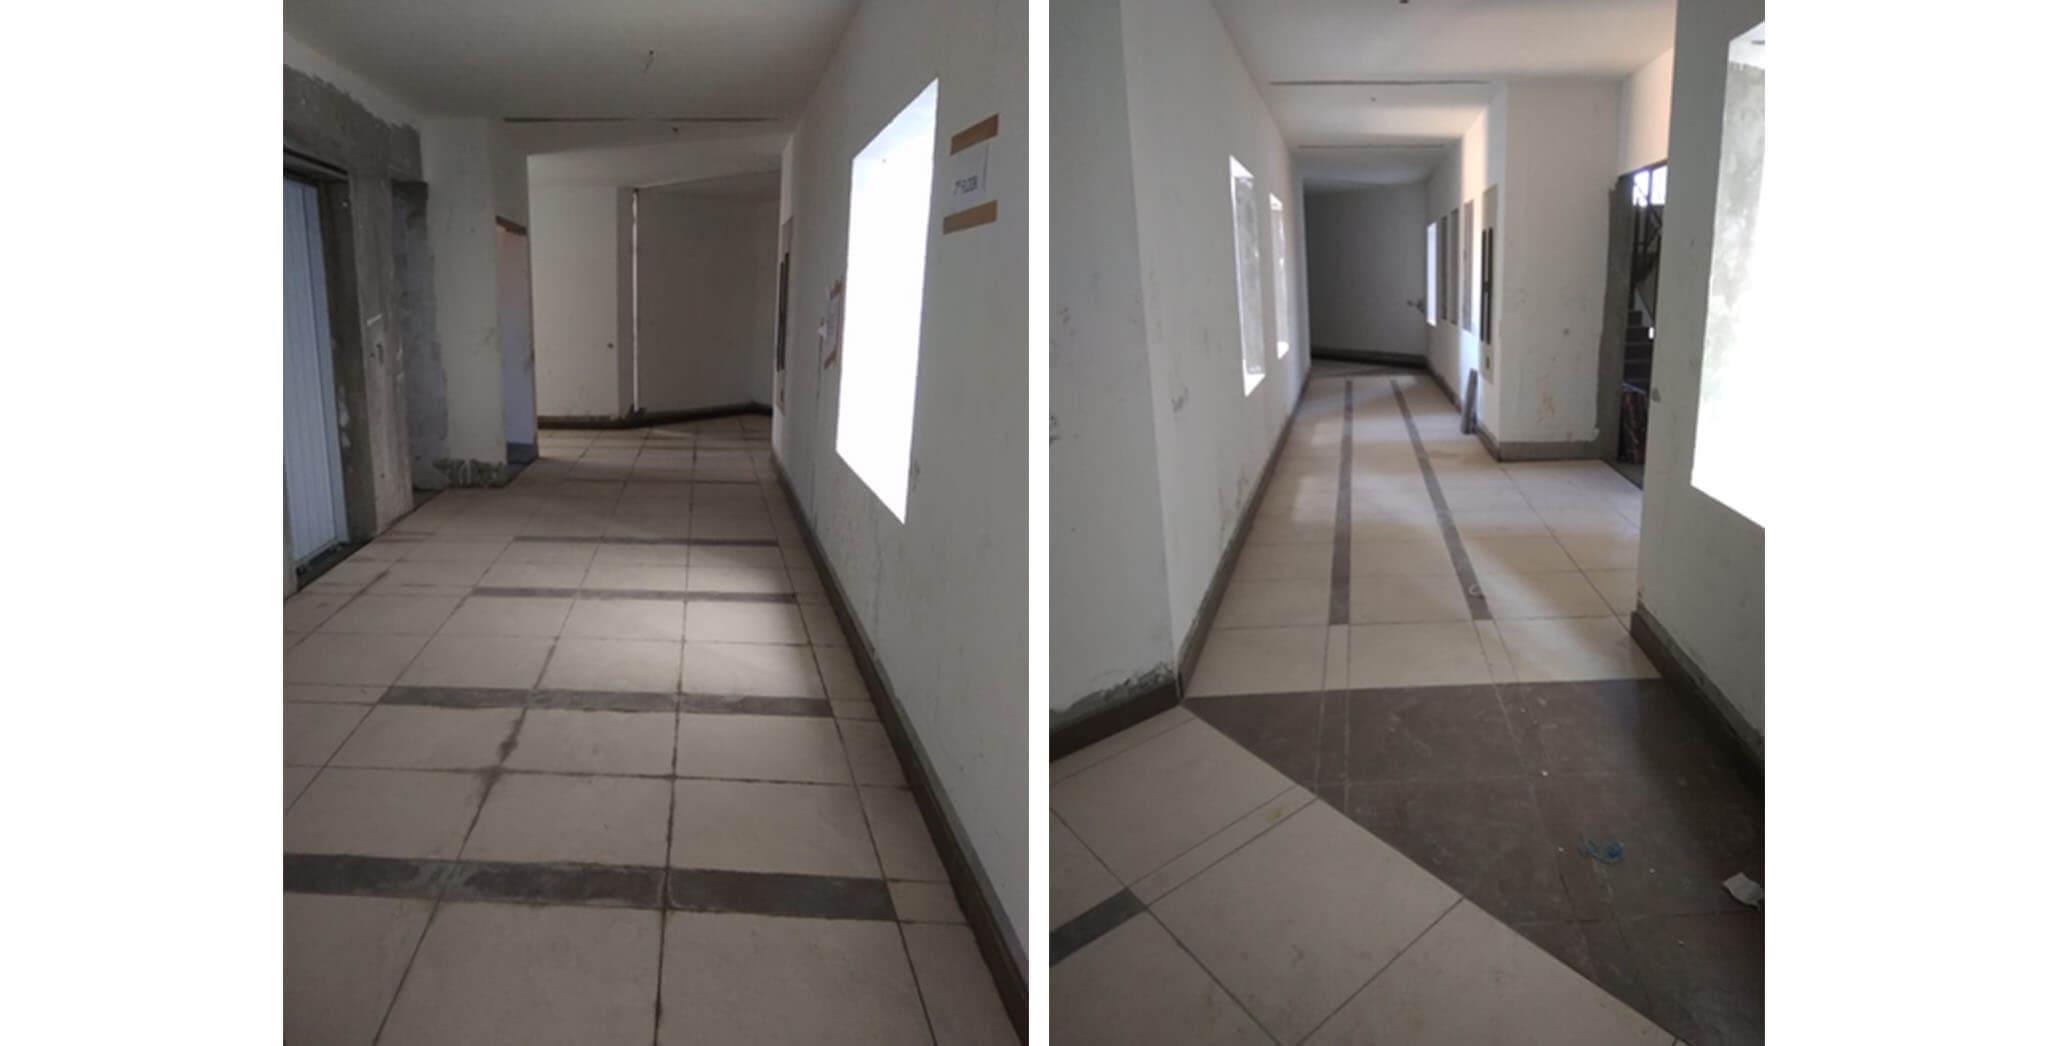 May 2020 - Tower C: Corridor